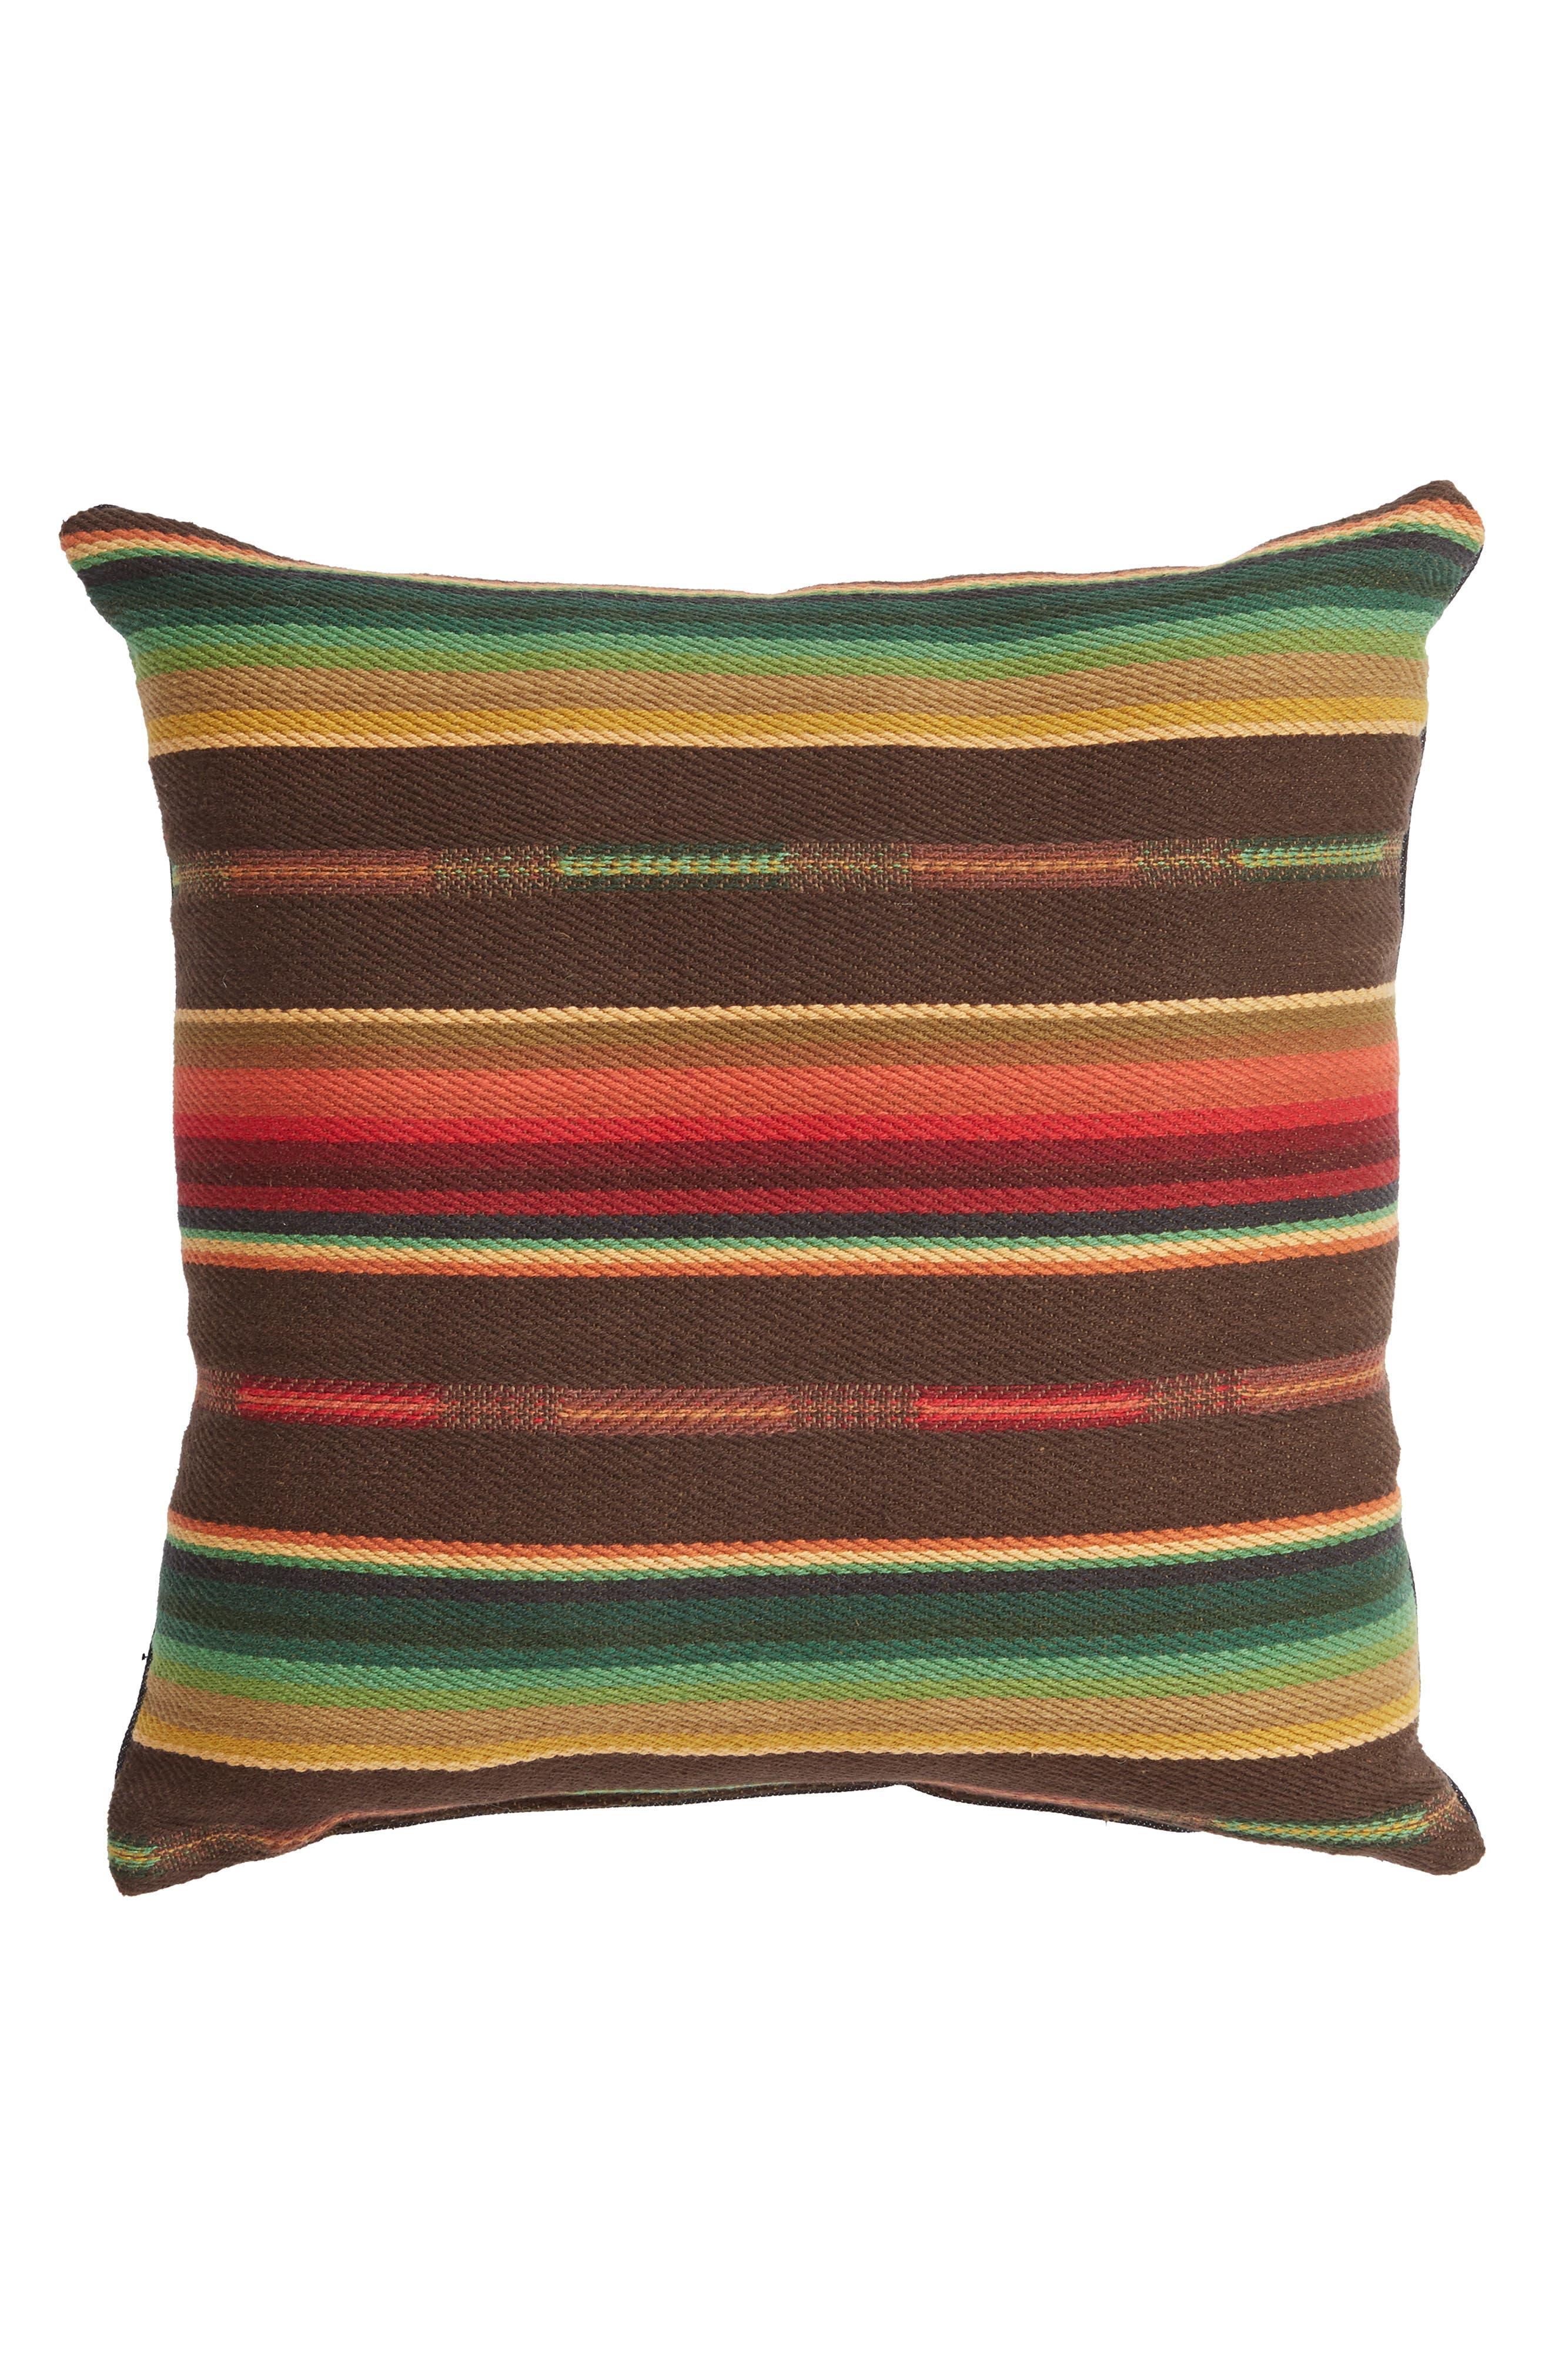 Small Sundance Serape Square Accent Pillow,                             Main thumbnail 1, color,                             001